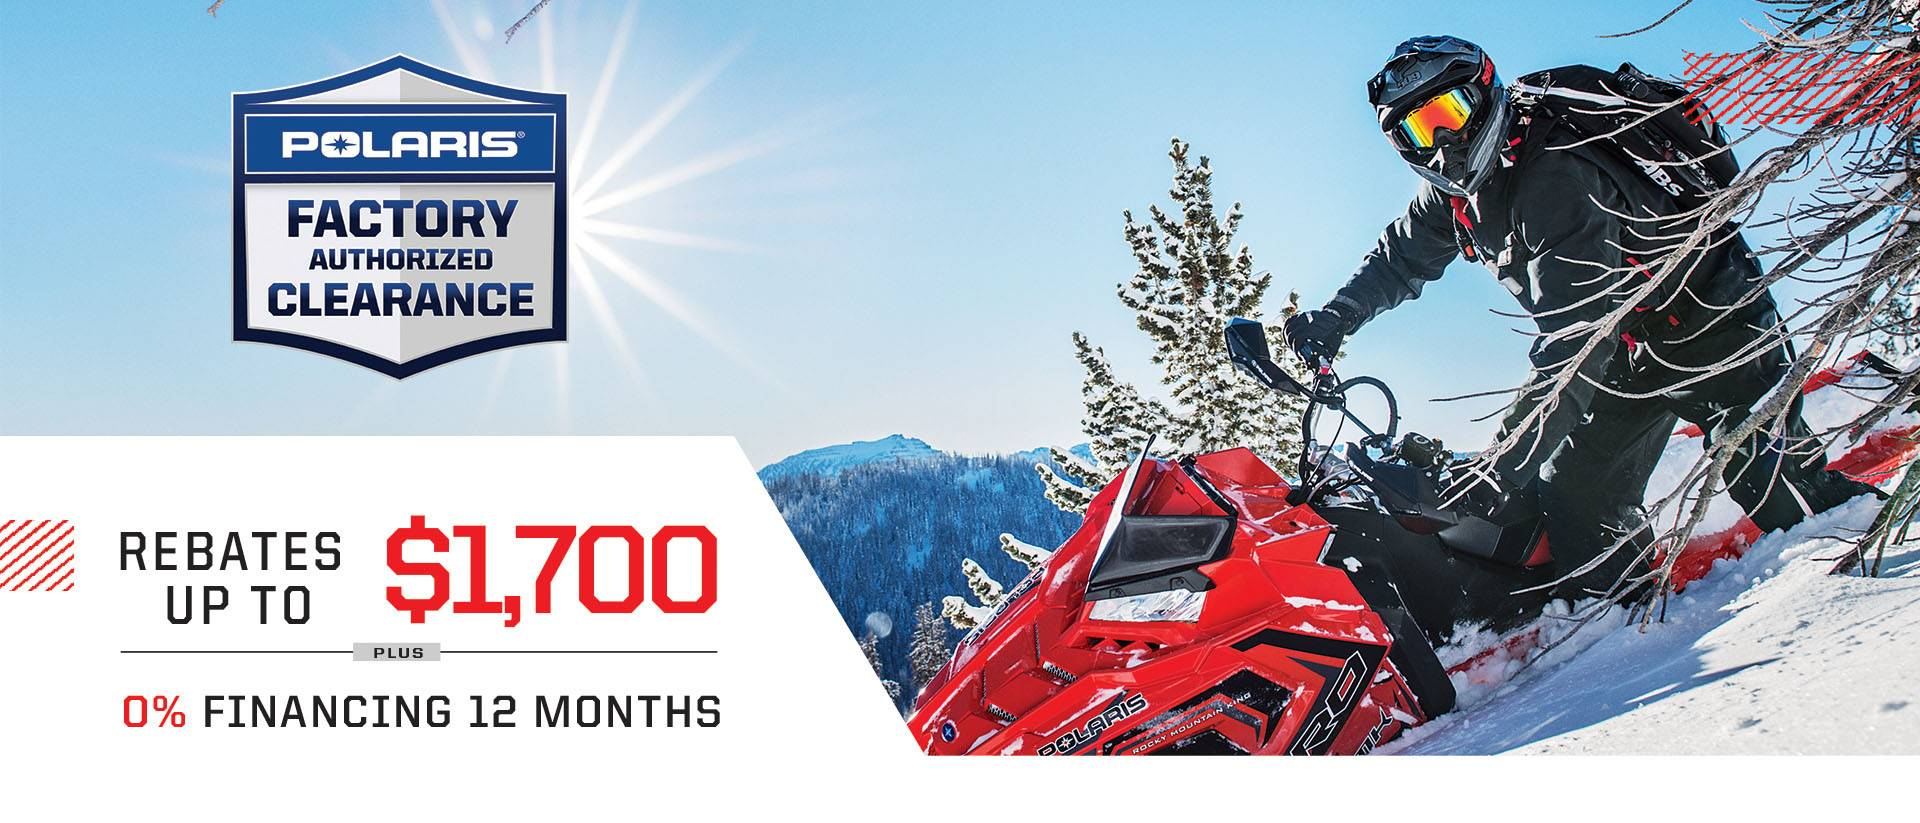 Carl's Cycle Sales: Motorcycles, ATVs & UTVs for Sale, Boise ID